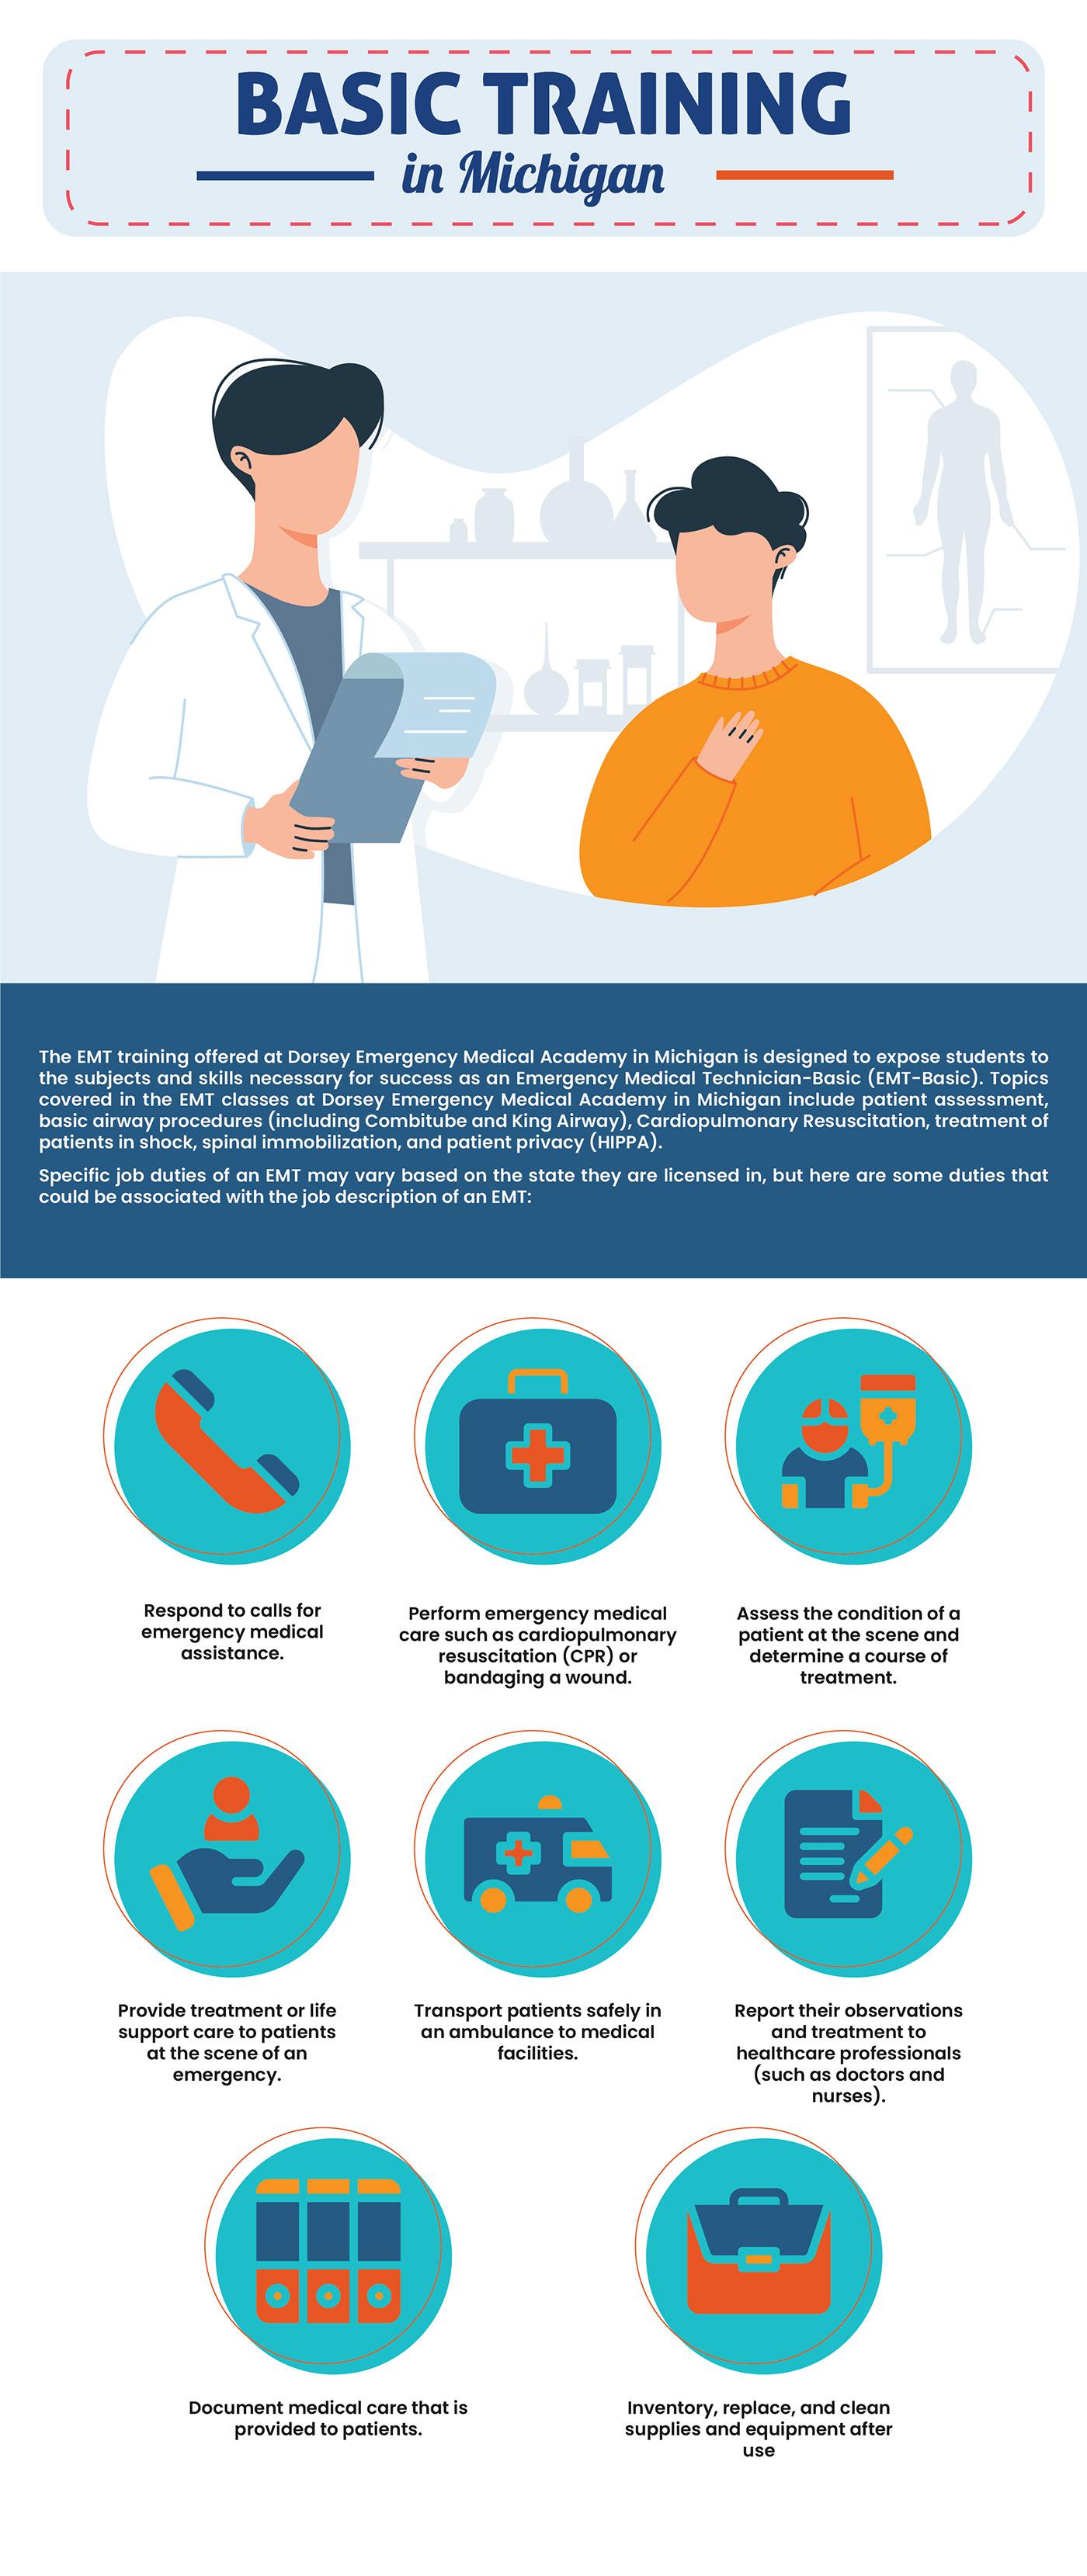 EMT-Basic-Training-in-Michigan-infographic-plaza